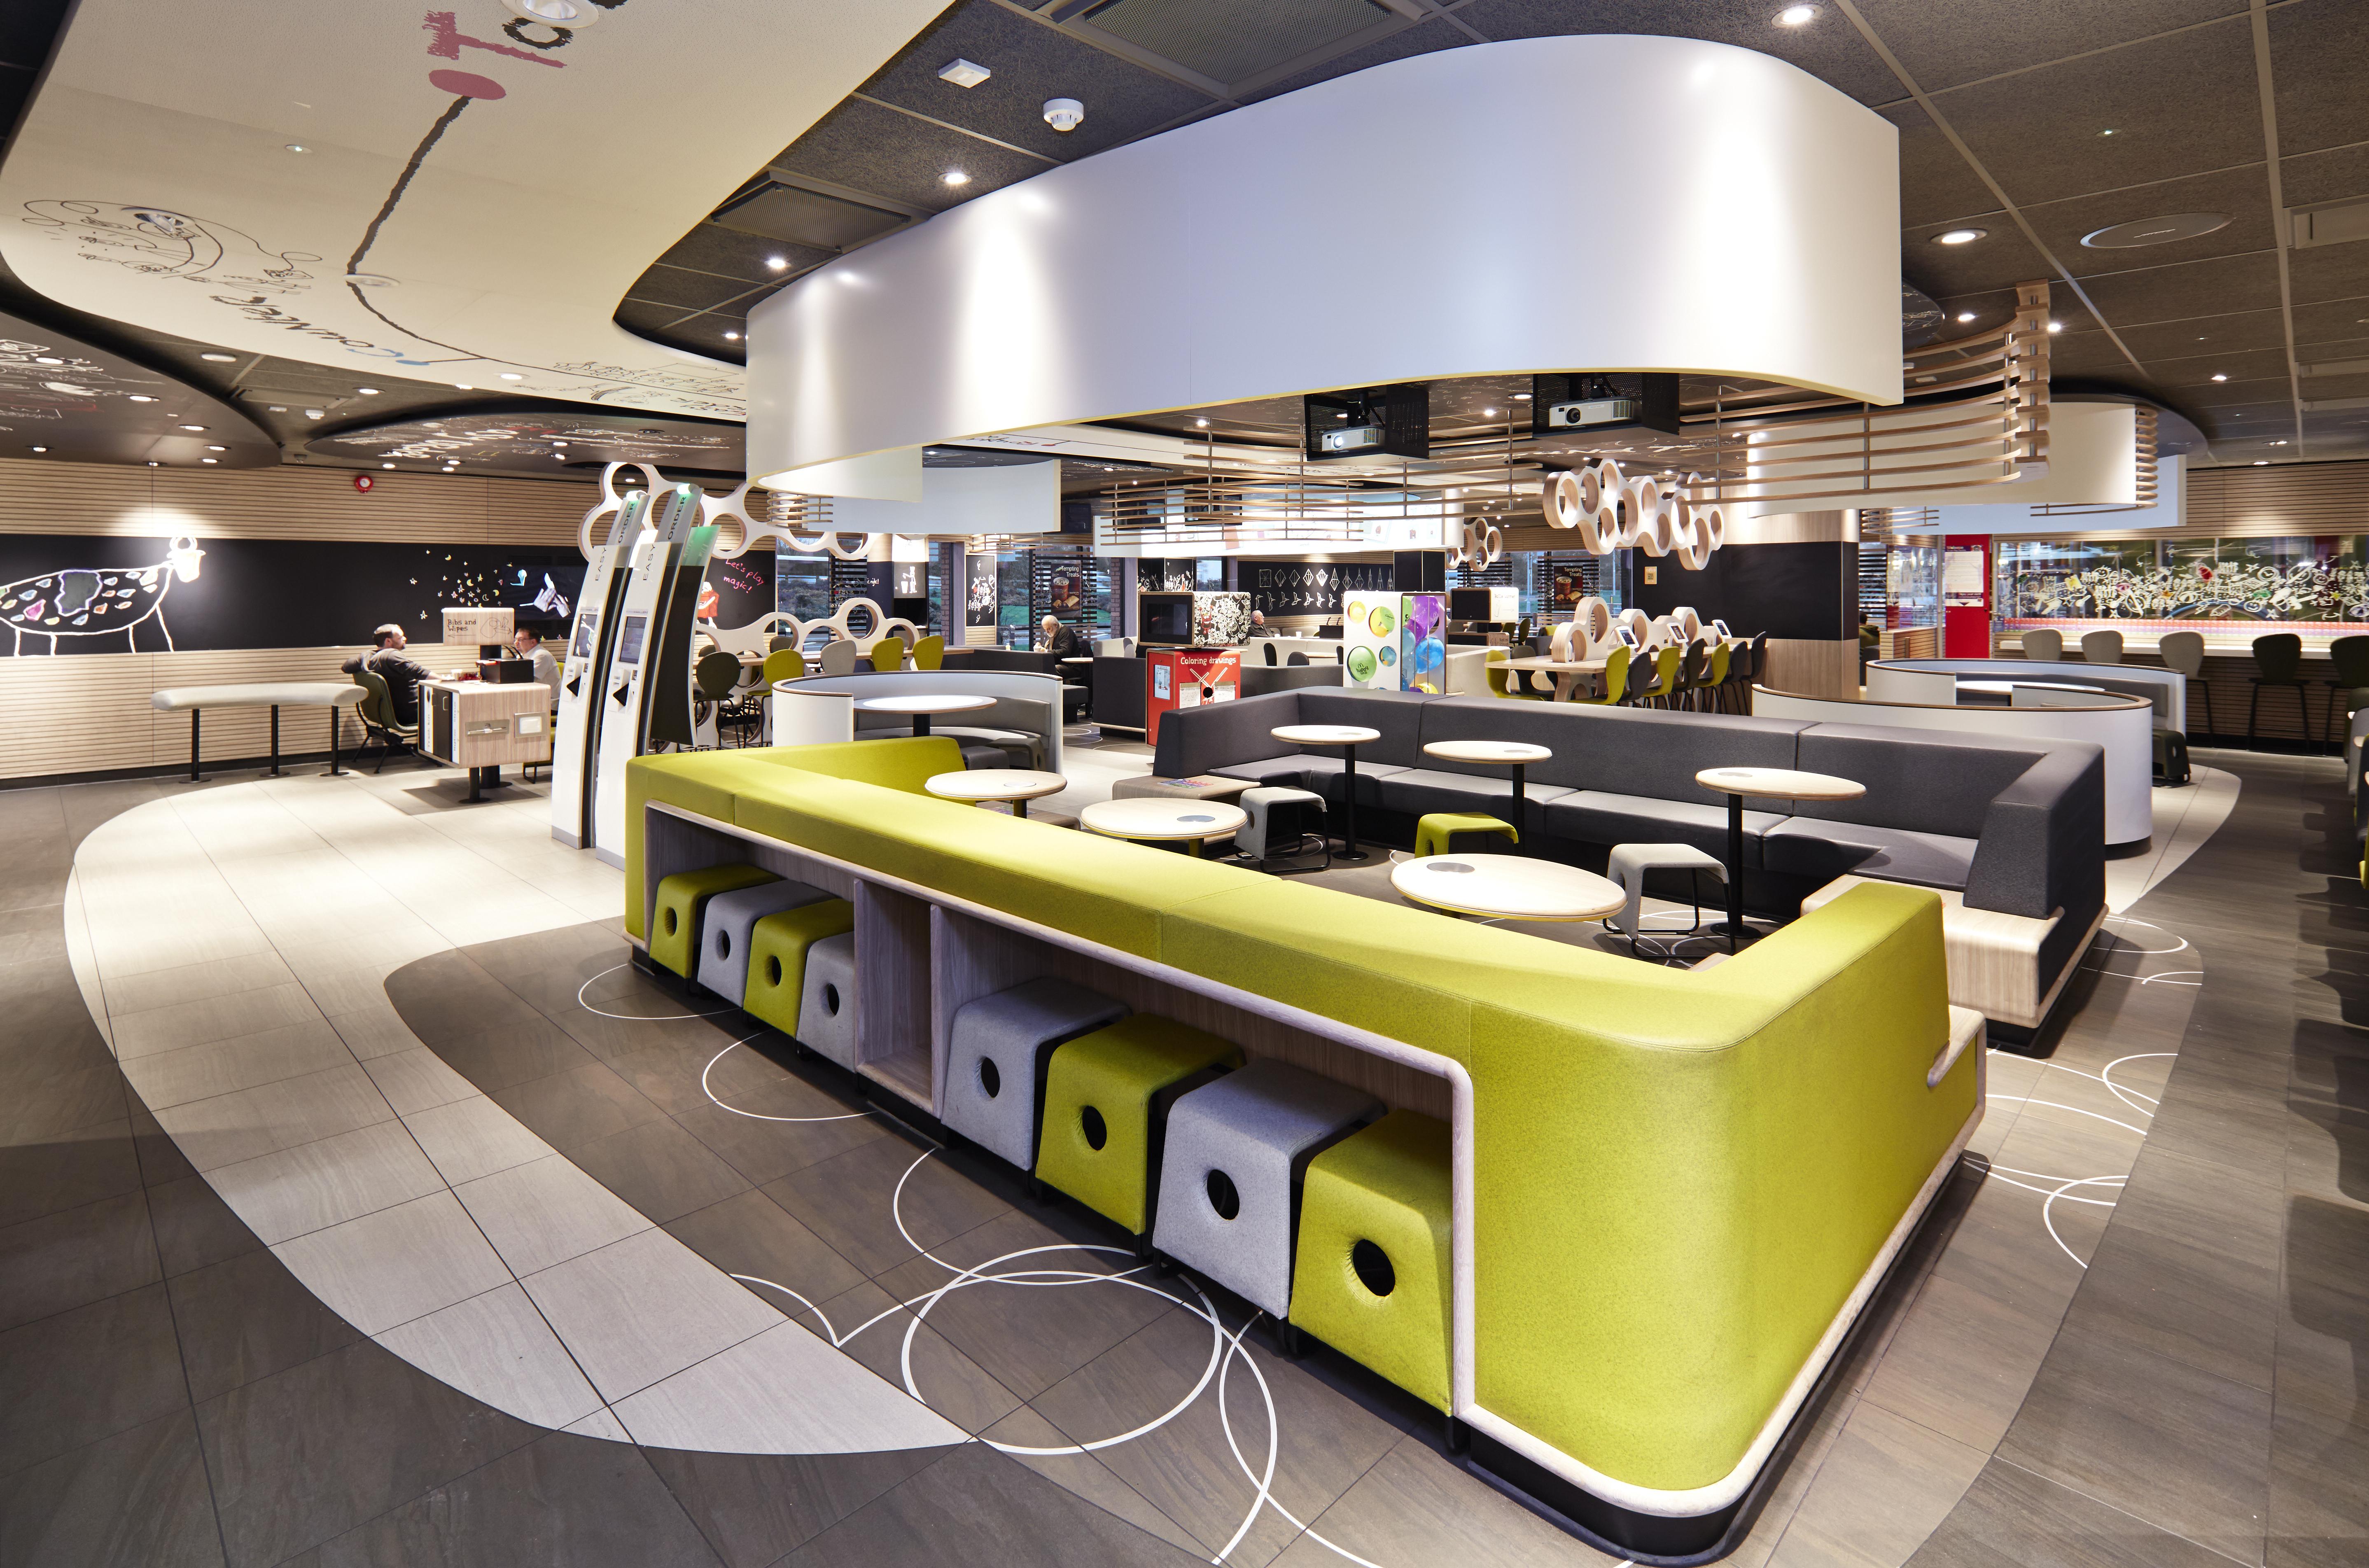 McDonald's Brings Tablets into Restaurants